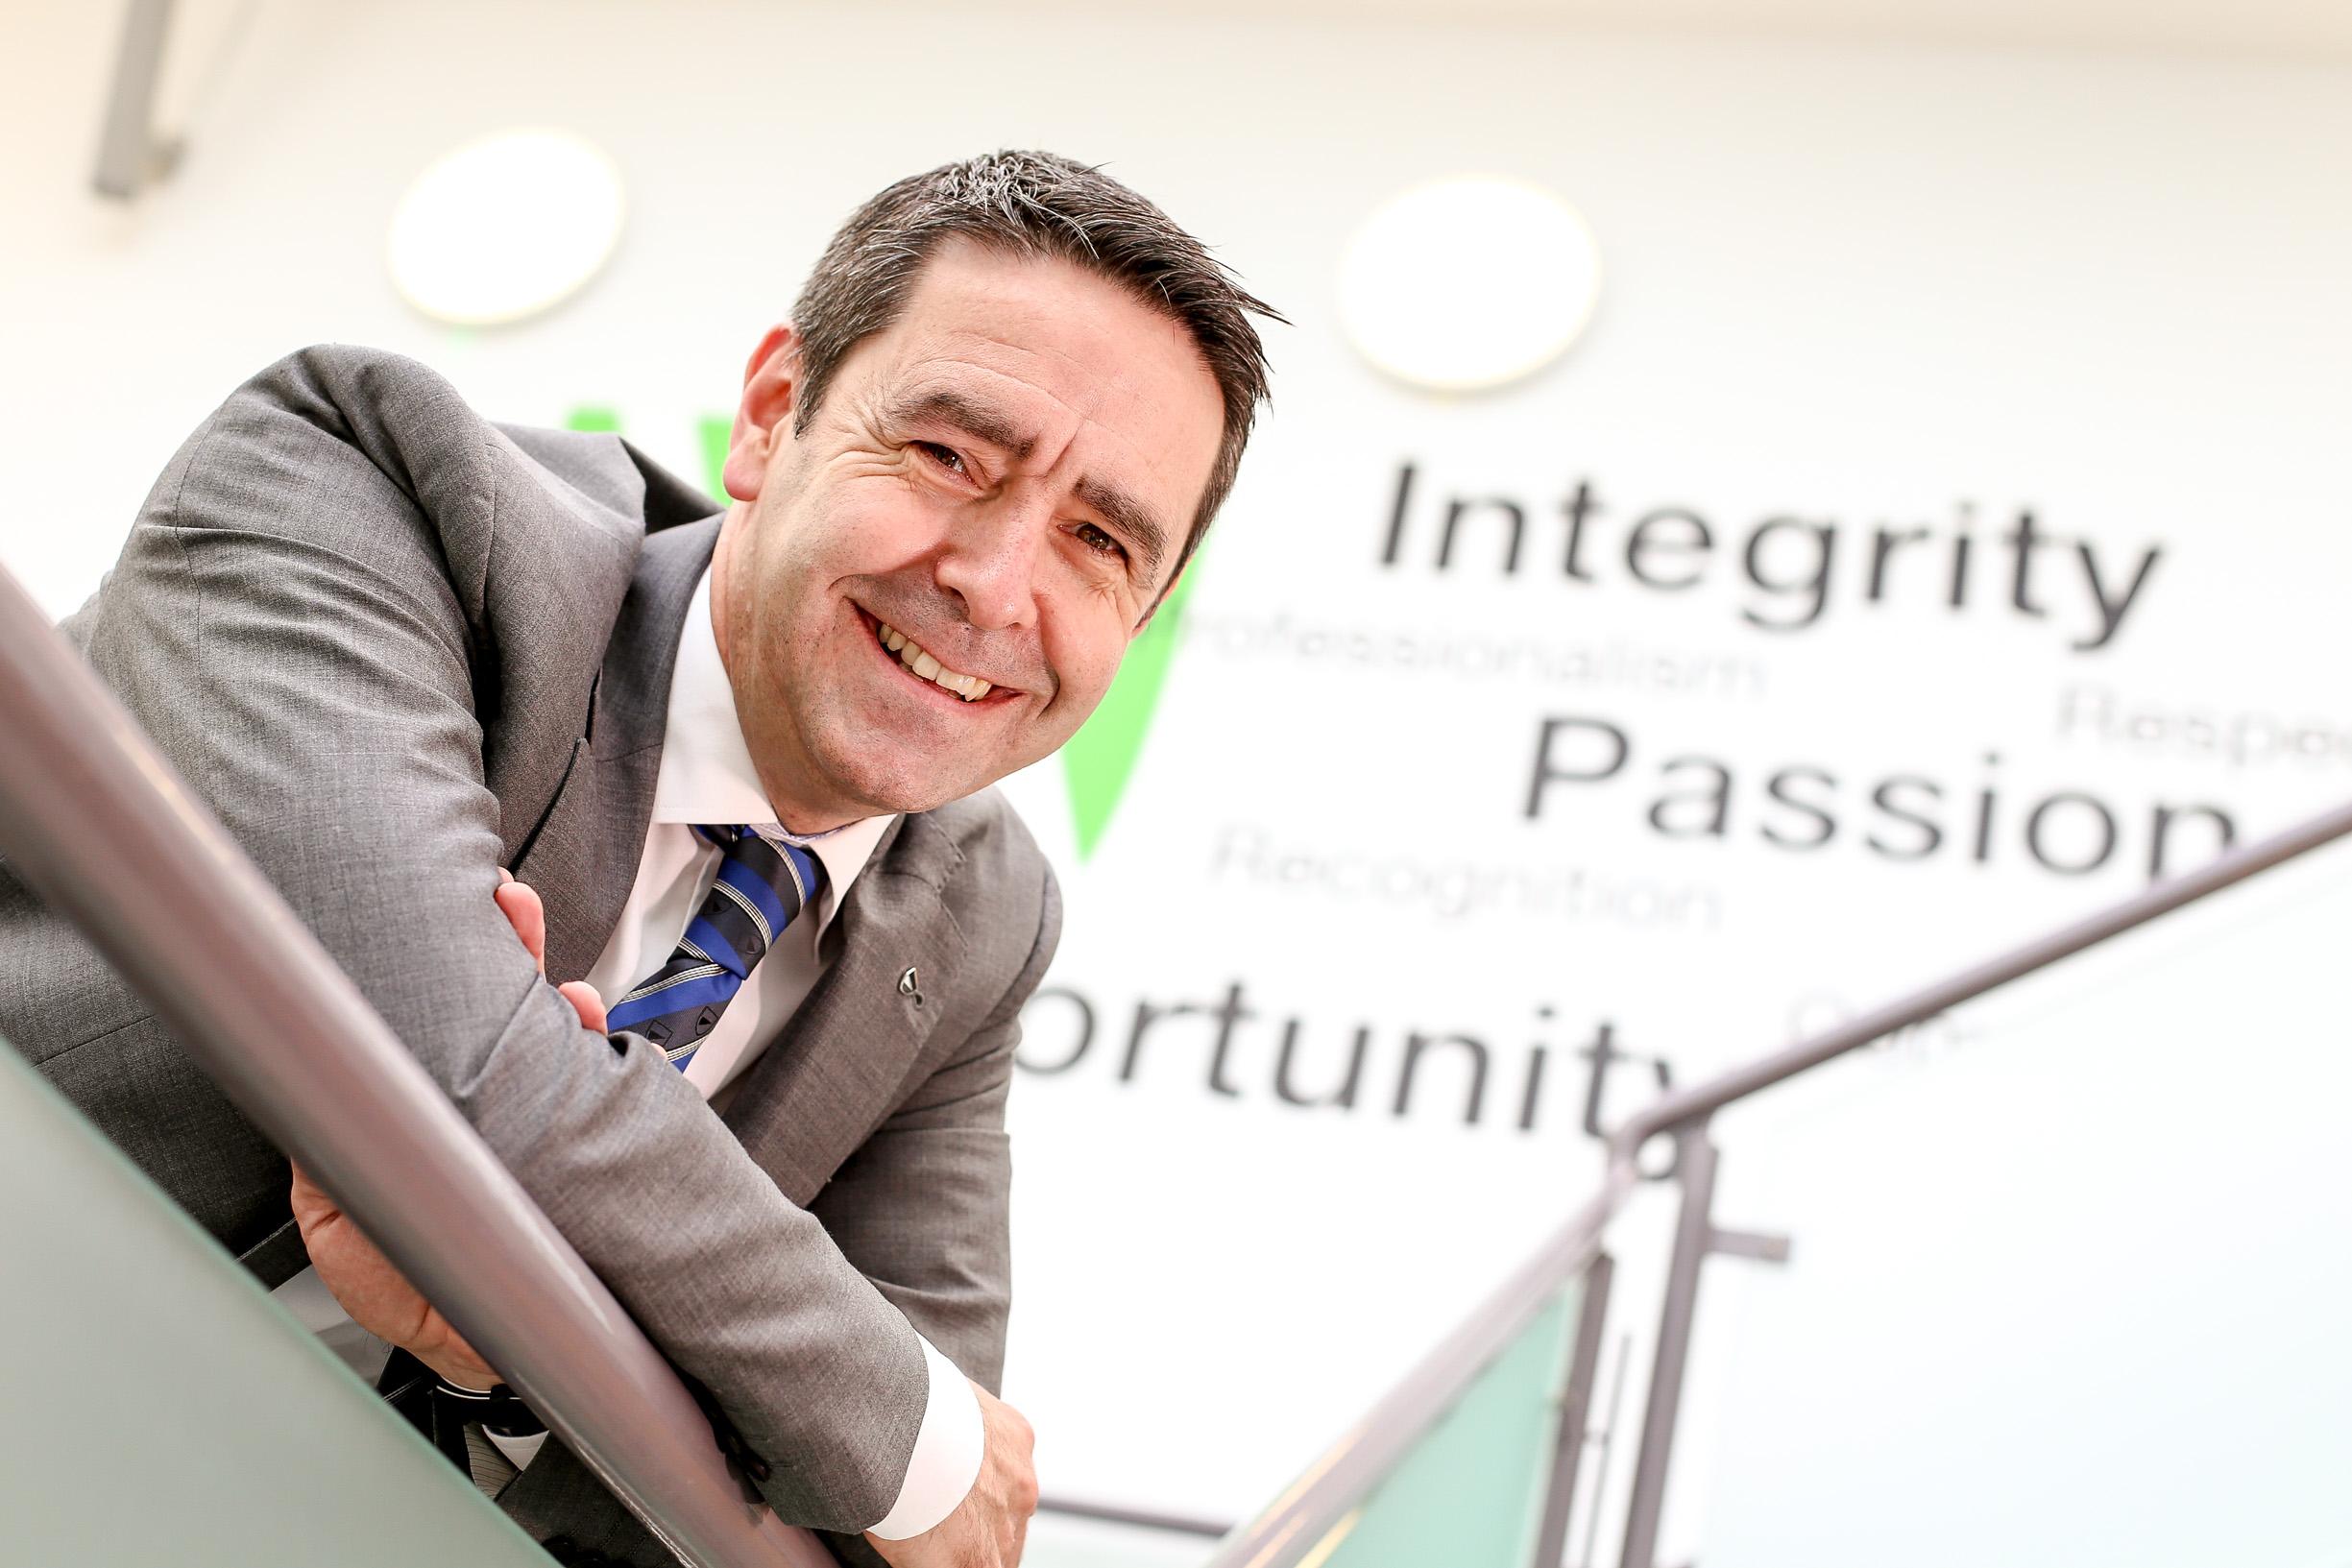 Vertu Motors appoints David Crane as Executive Director